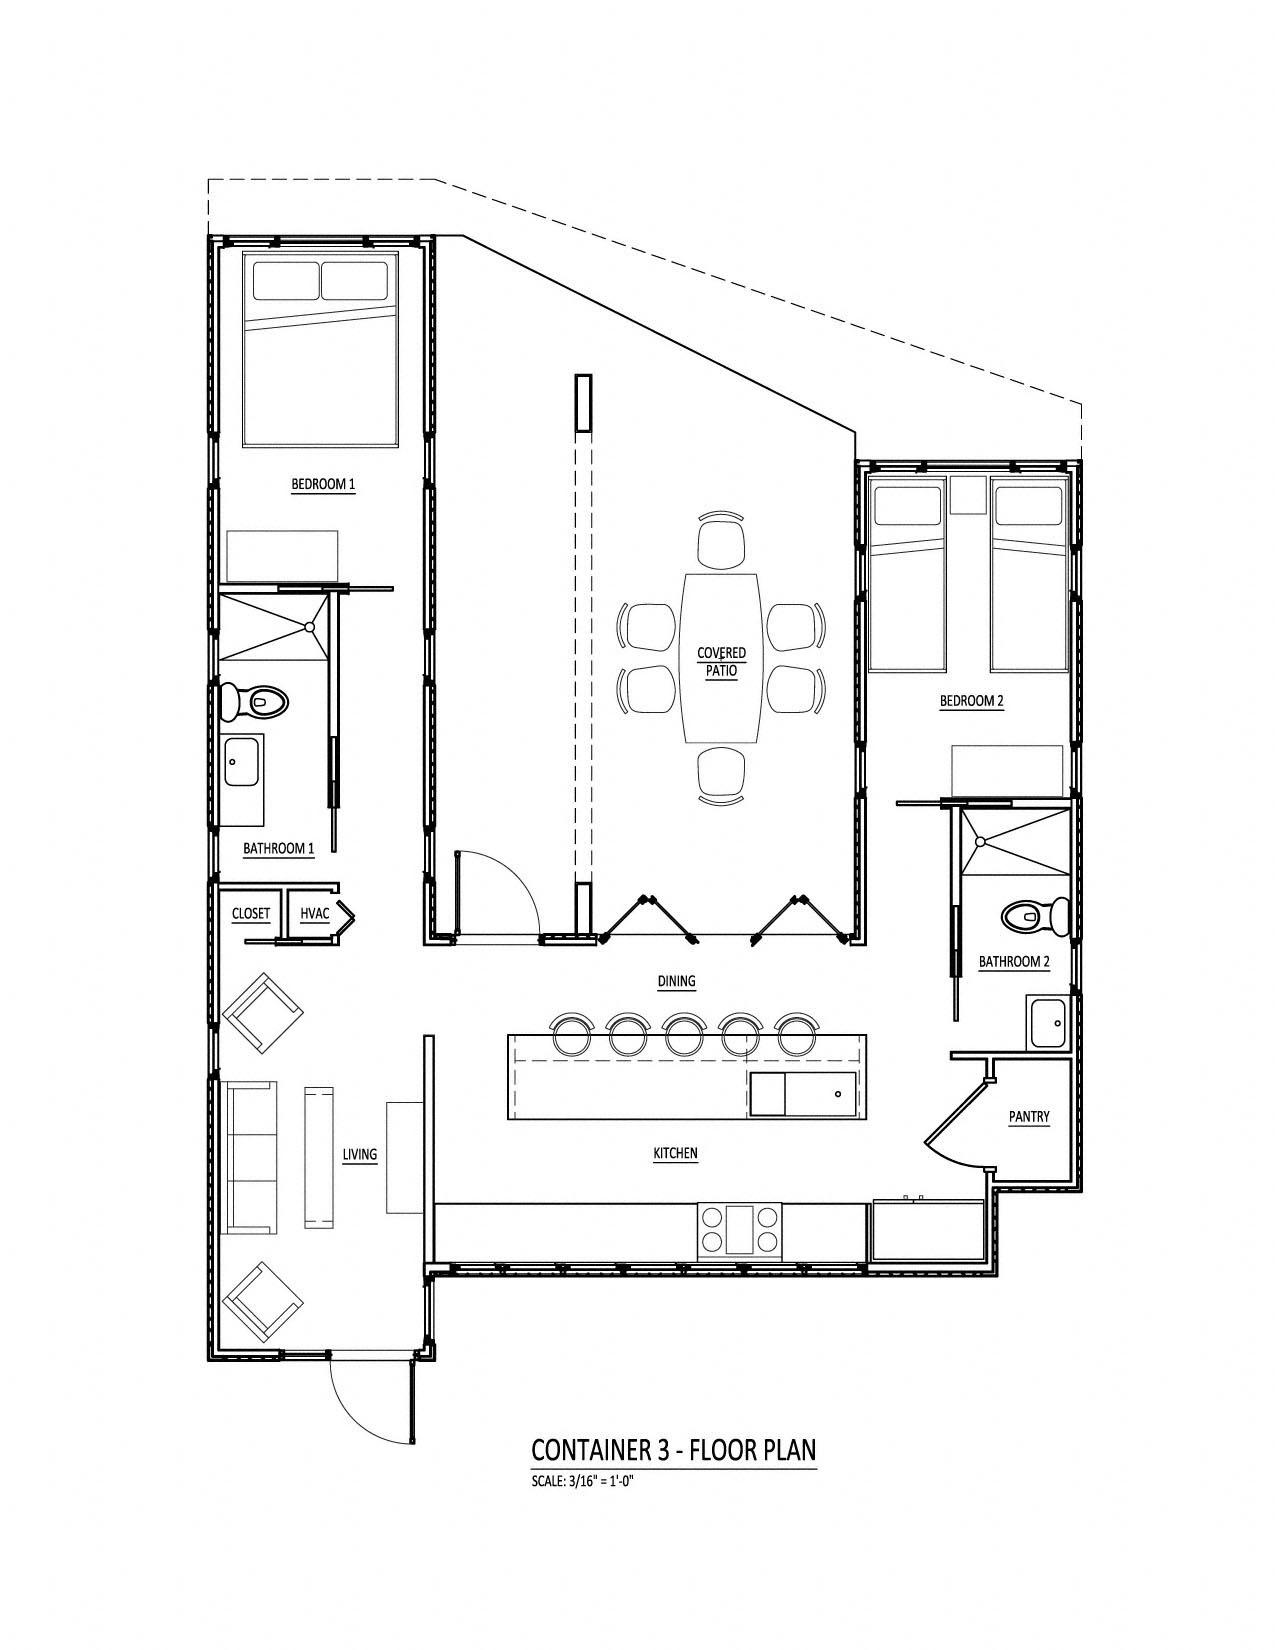 Shipping Container Floor Plans conex box home floor plans – meze blog